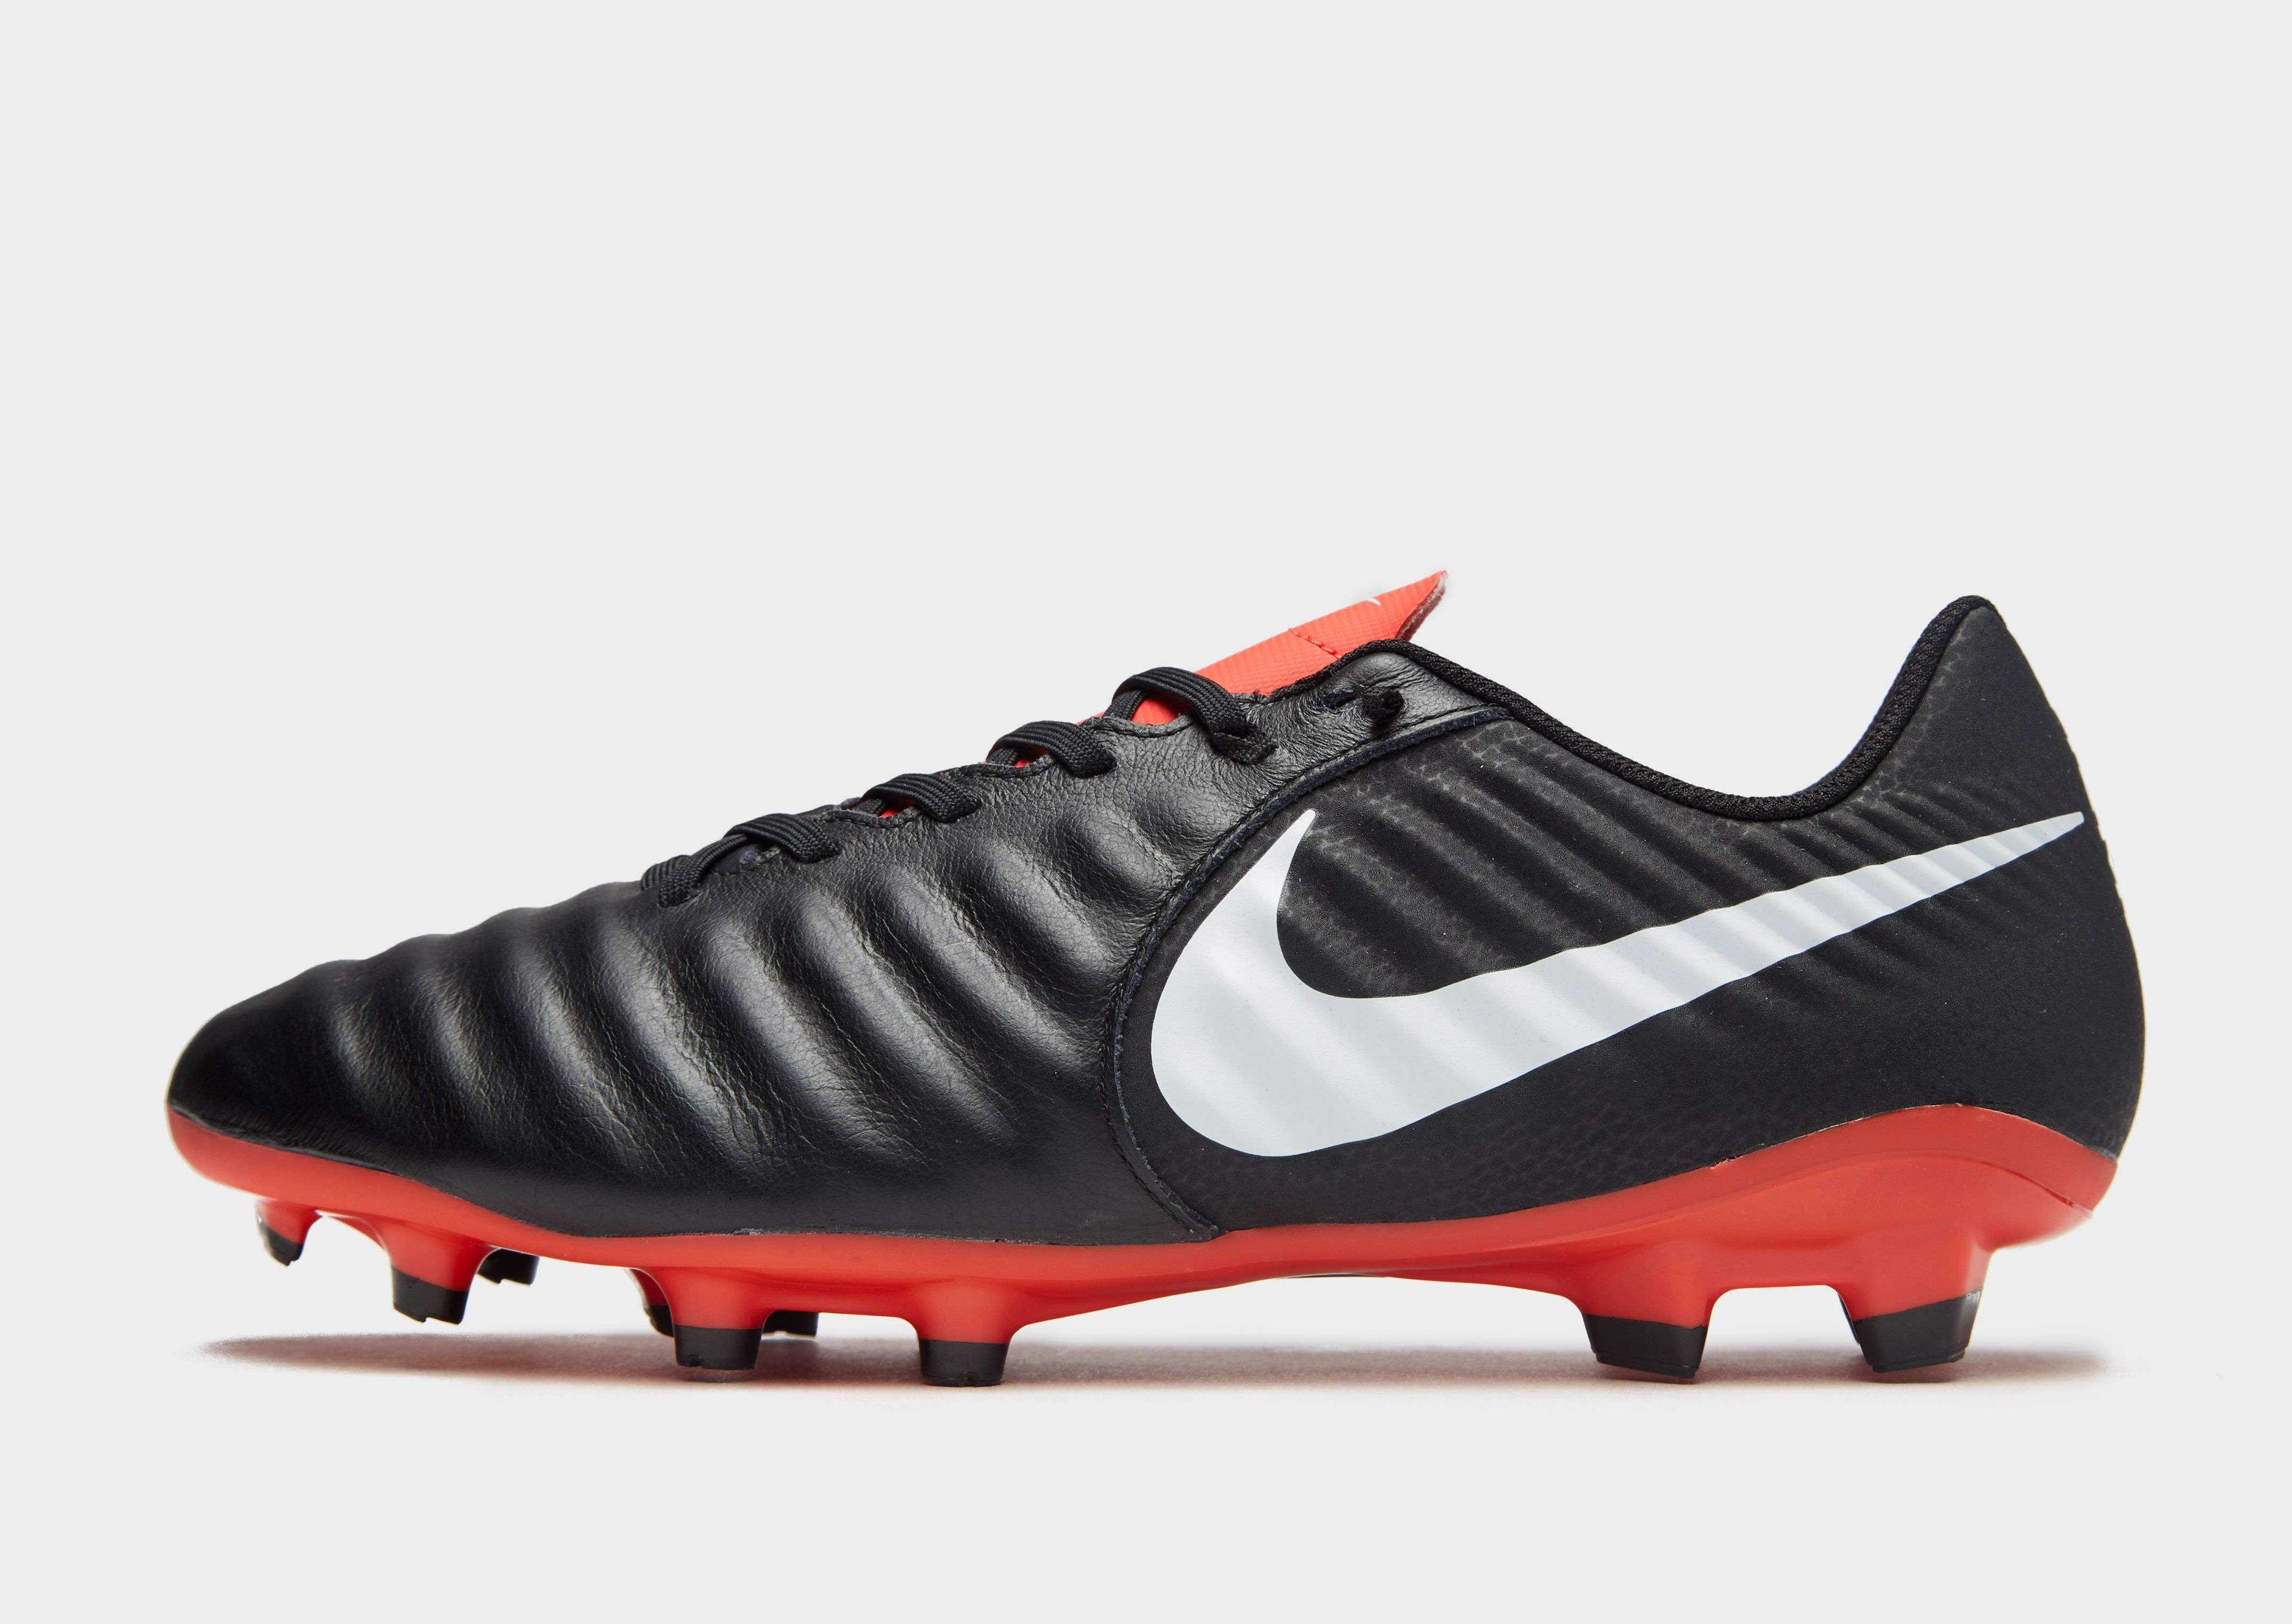 pretty nice 743c9 75808 NIKE Nike Tiempo Legend VII Academy Firm-Ground Football Boot  JD Sports